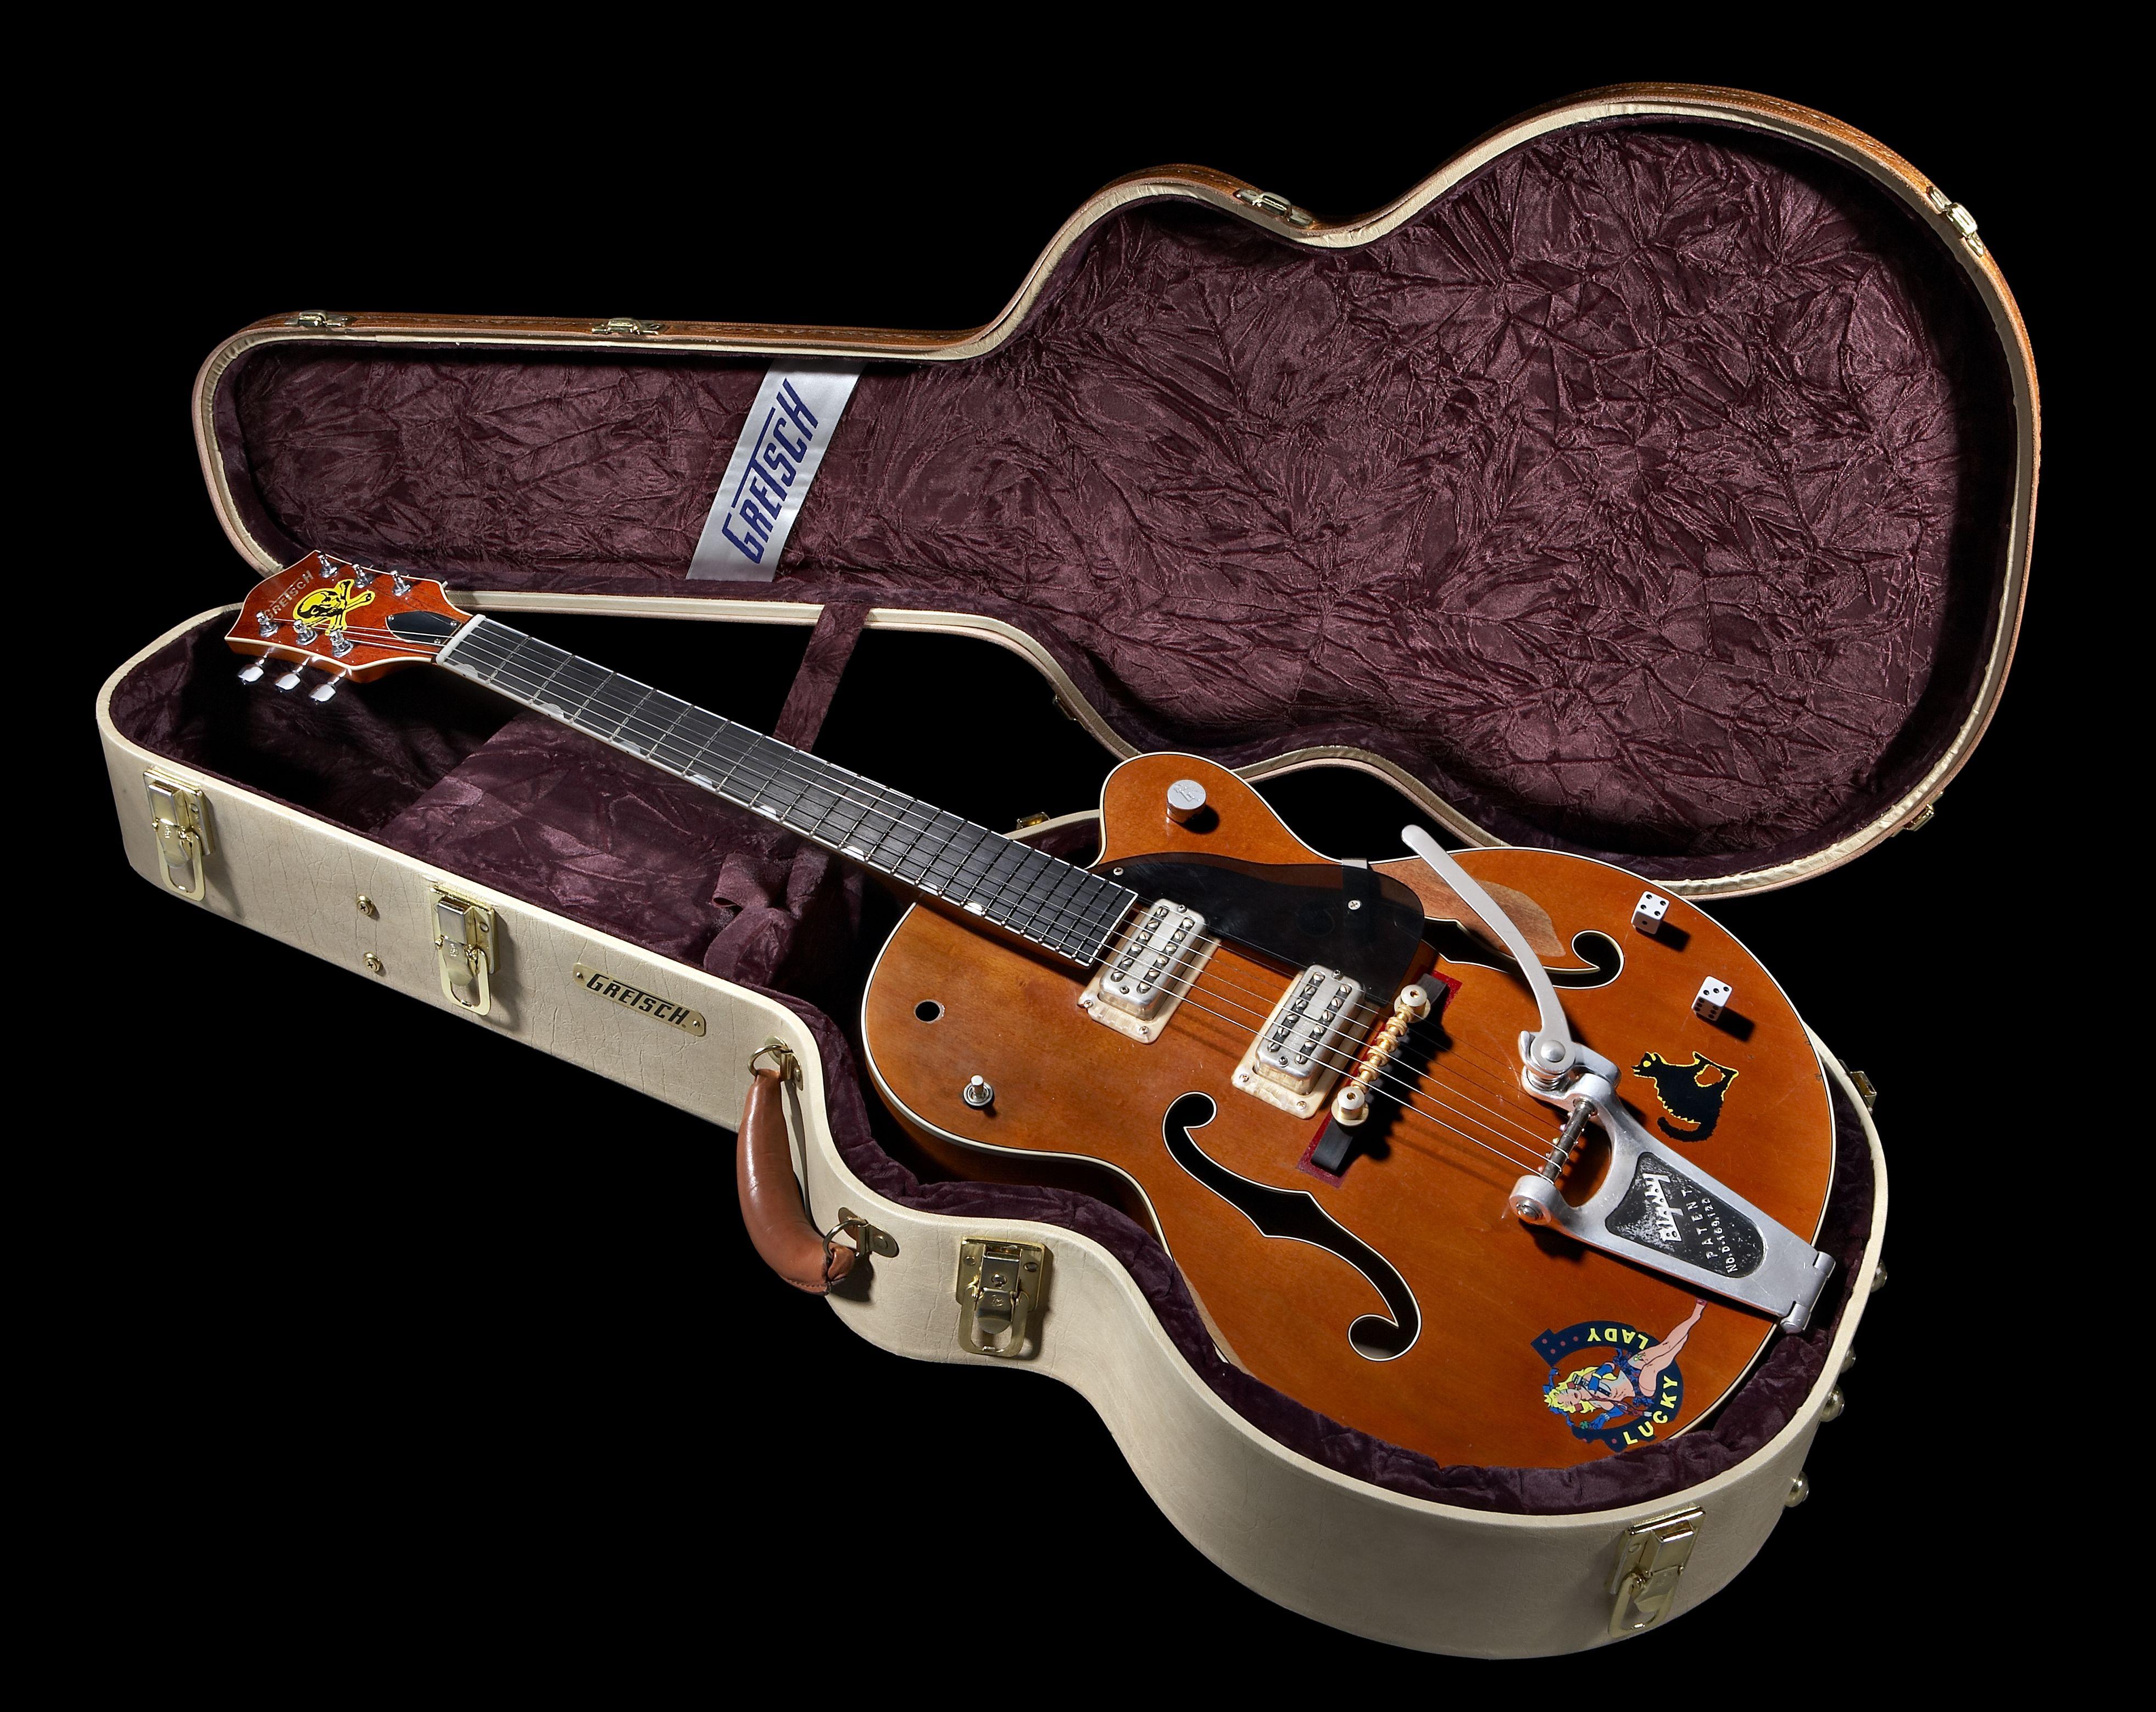 Gretsch Brian Setzer Tribute Guitar Guitar Gretsch